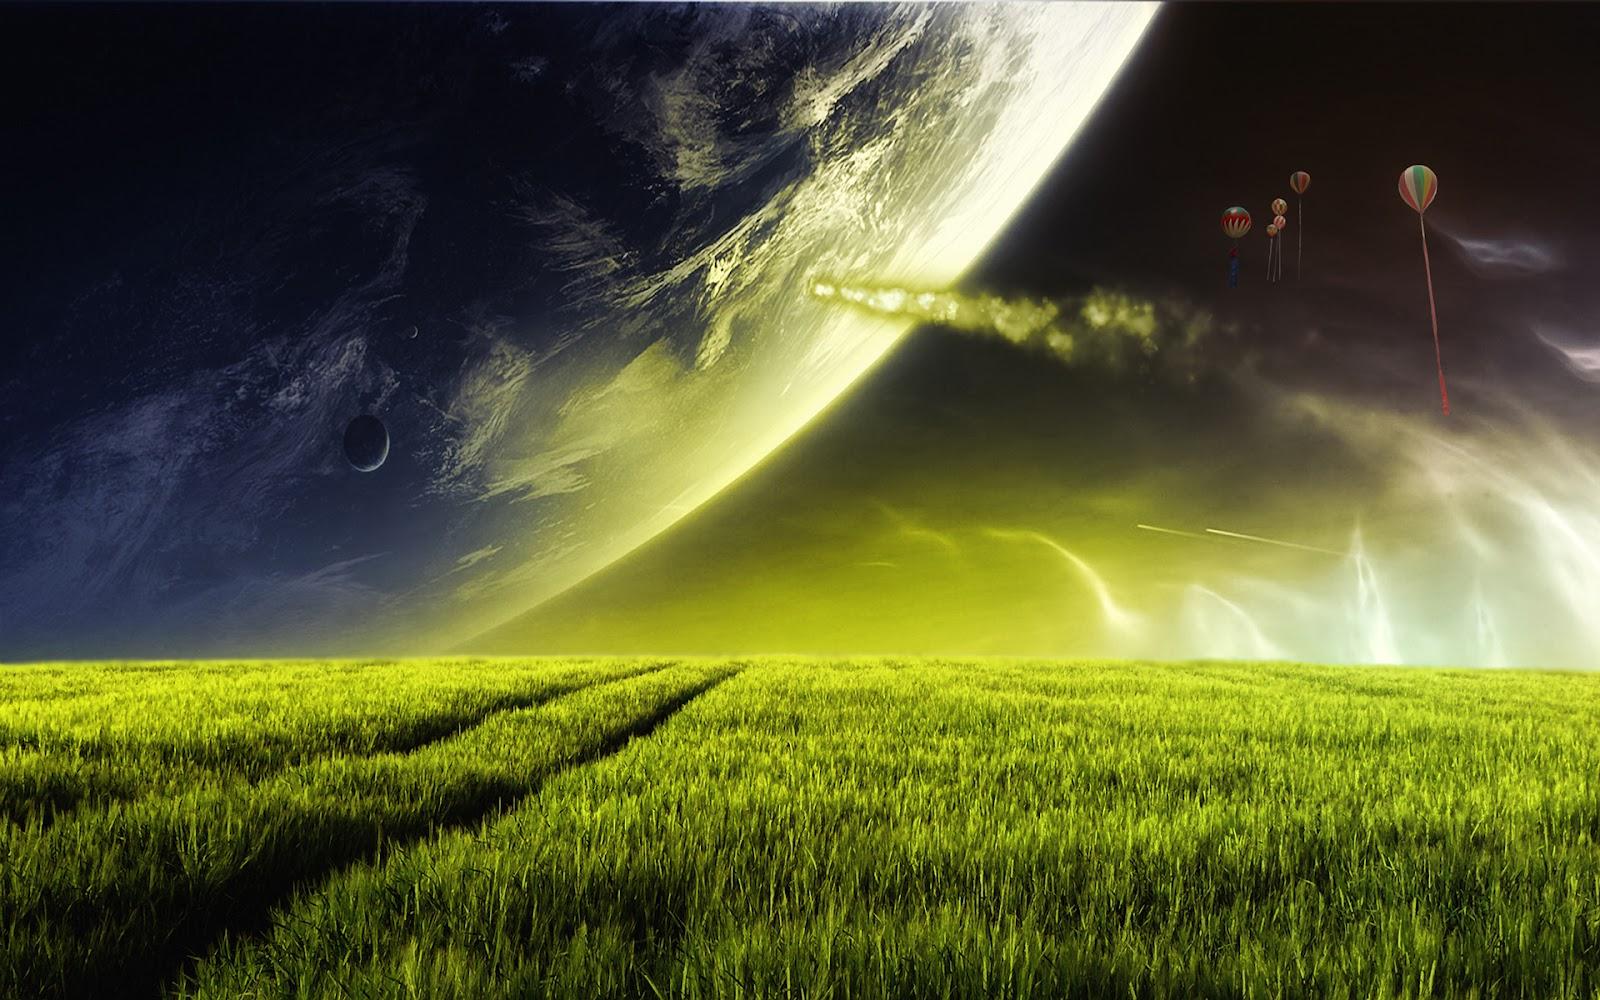 Fantasy-Landscape-Wallpaper-High-Quality-New